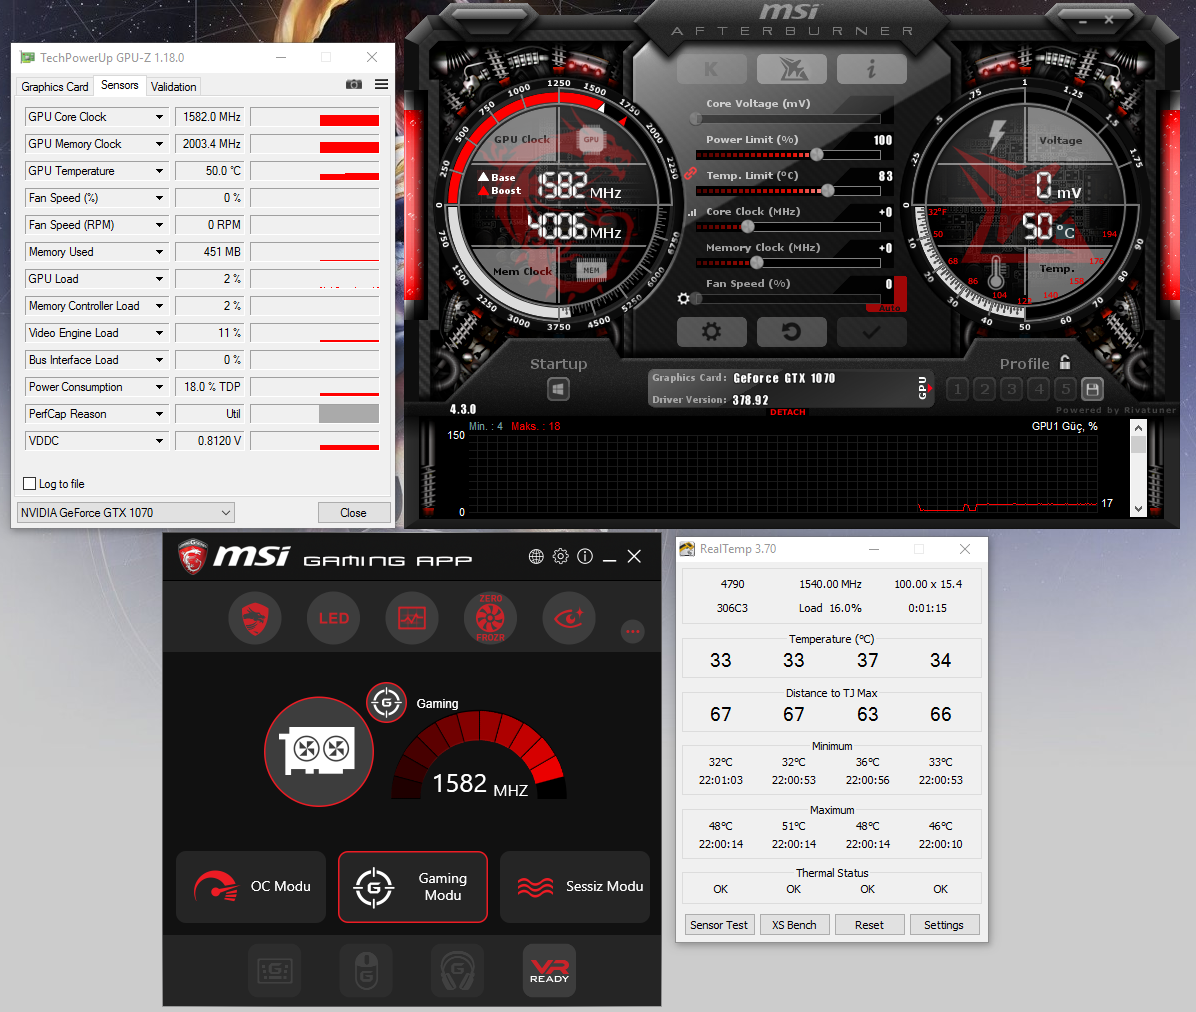 GPU Temp and Clock/Memory Speed is High on Idle